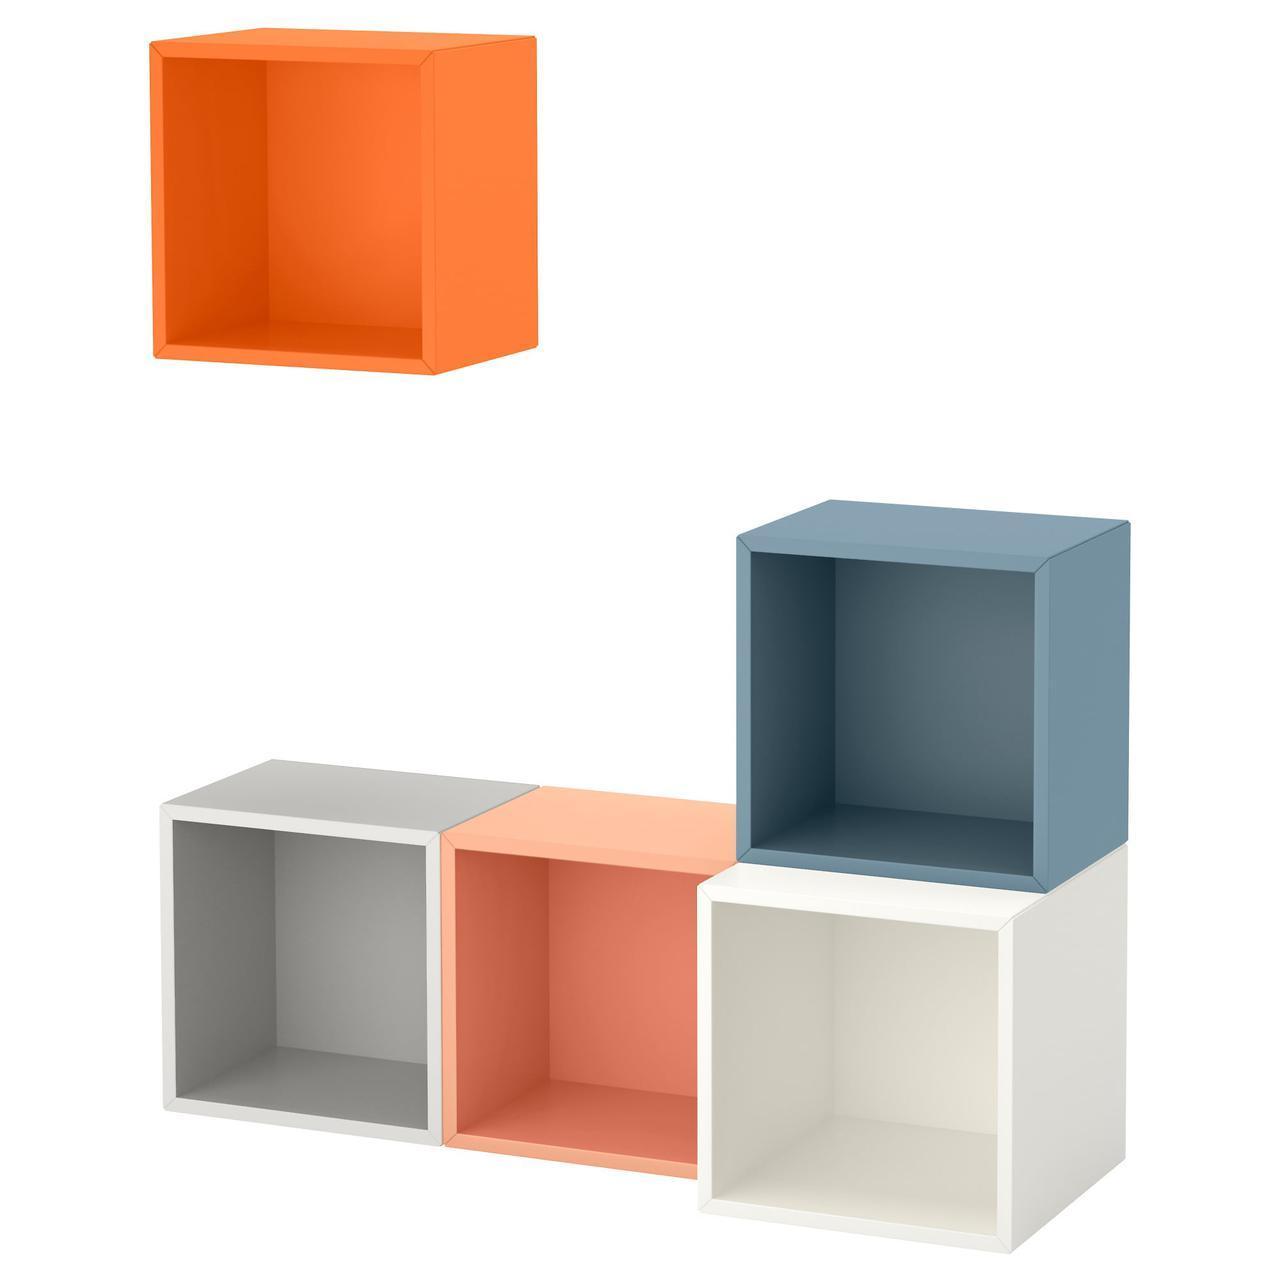 IKEA EKET (591.891.08) Комбинация настенных шкафов, разноцветных